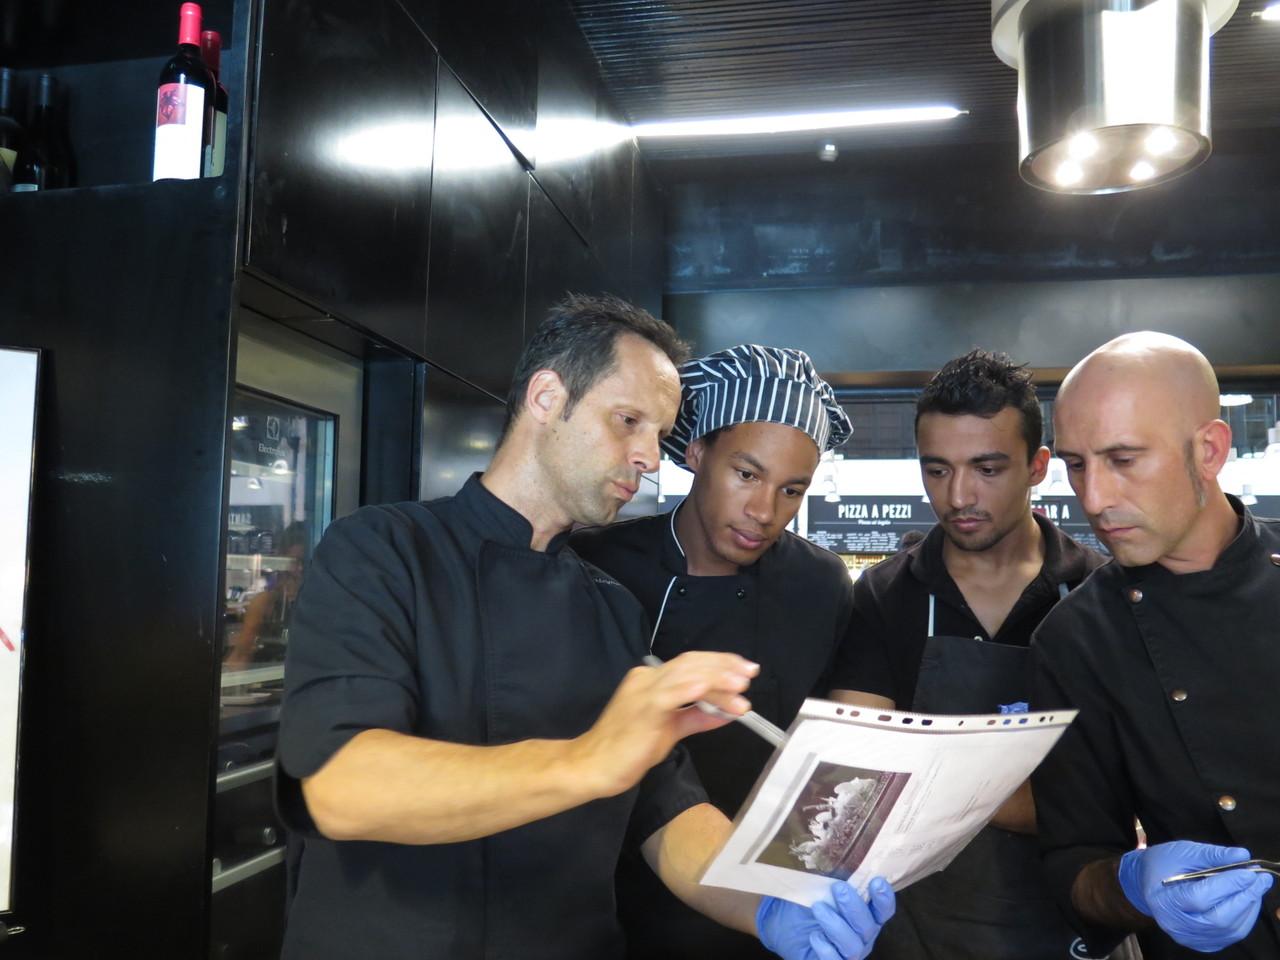 Pascal Meynard explicando o novo tártaro à equipa da TARTAR-IA